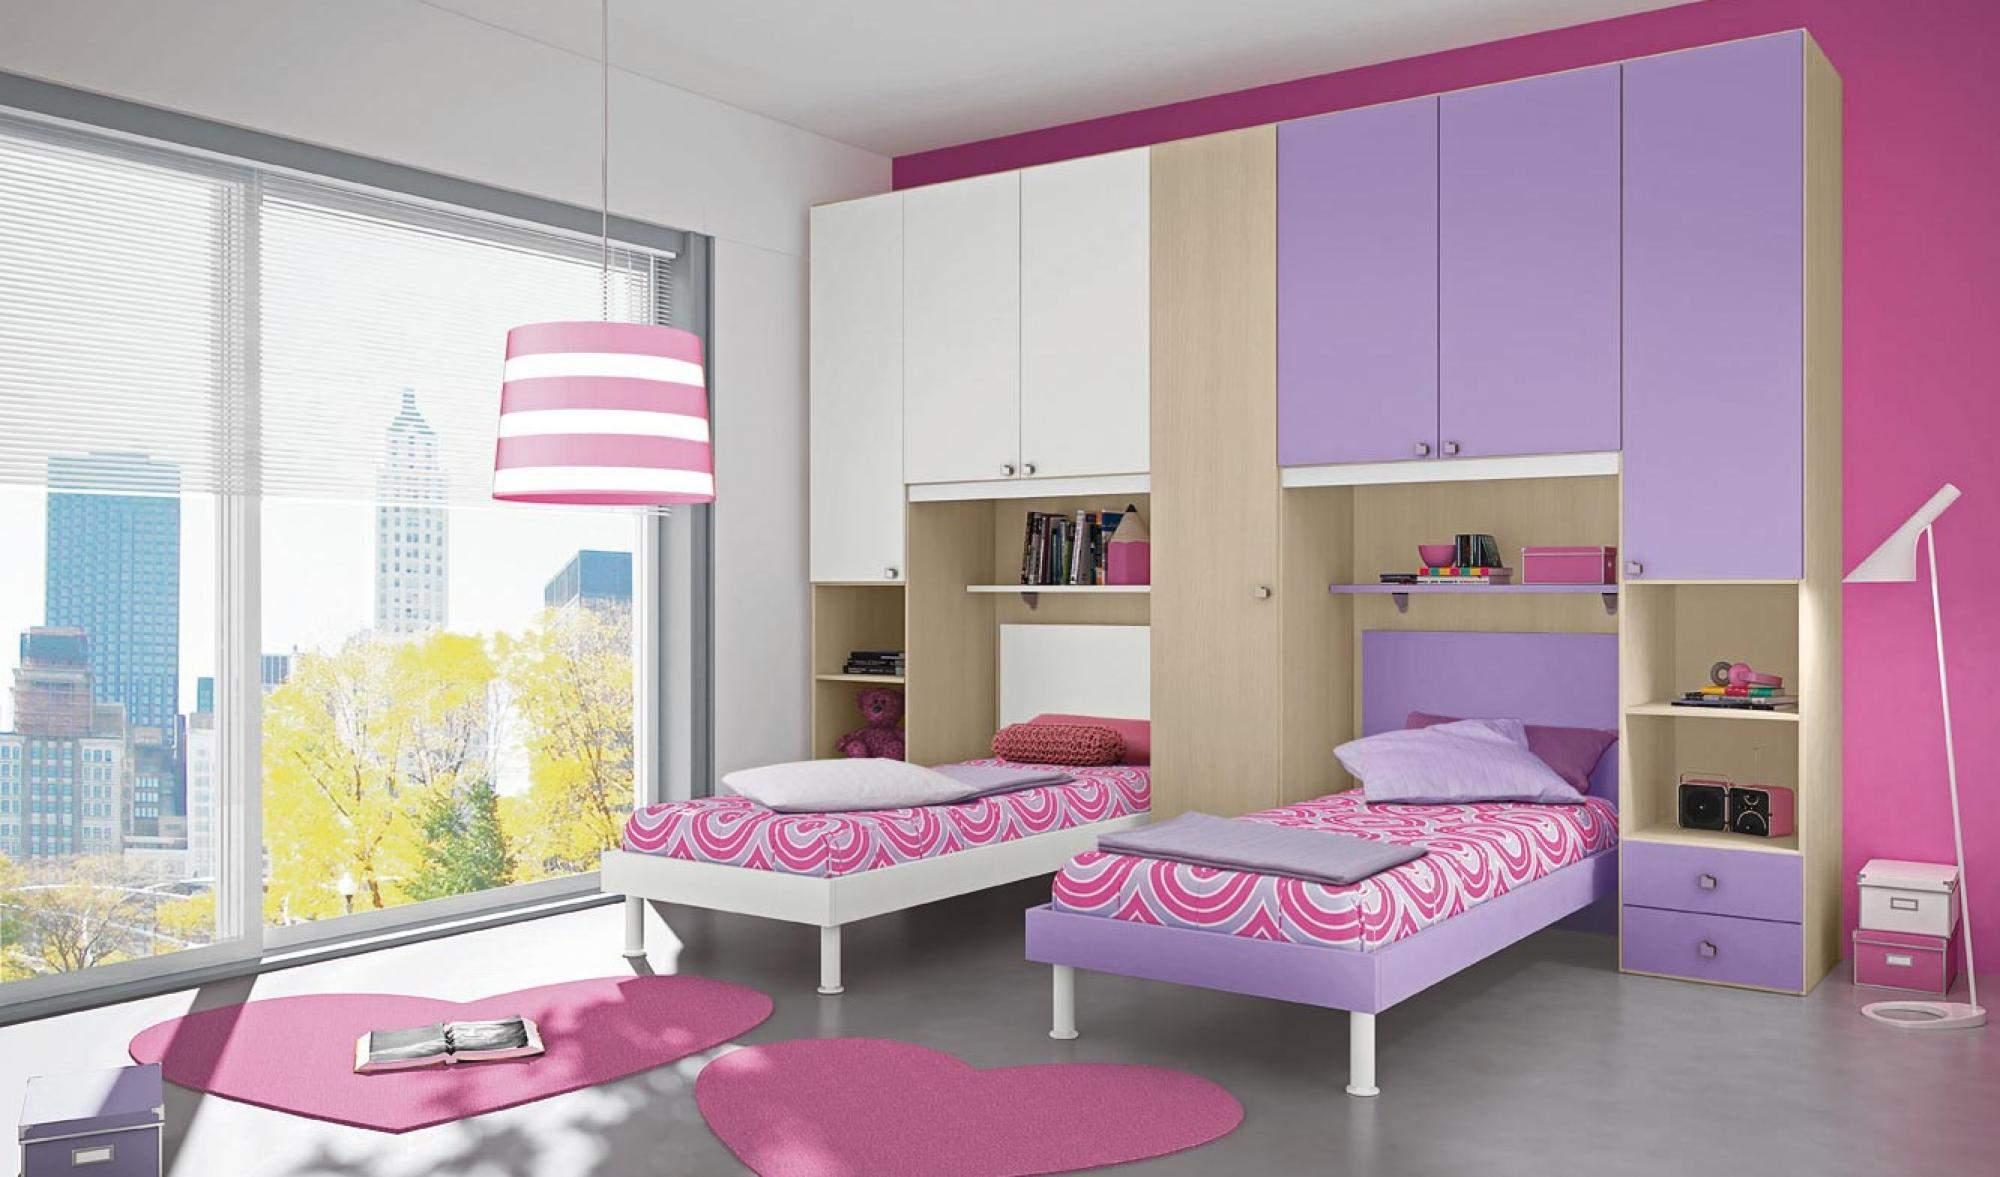 Camere per ragazzi pignoloni - Camerette per stanze piccole ...